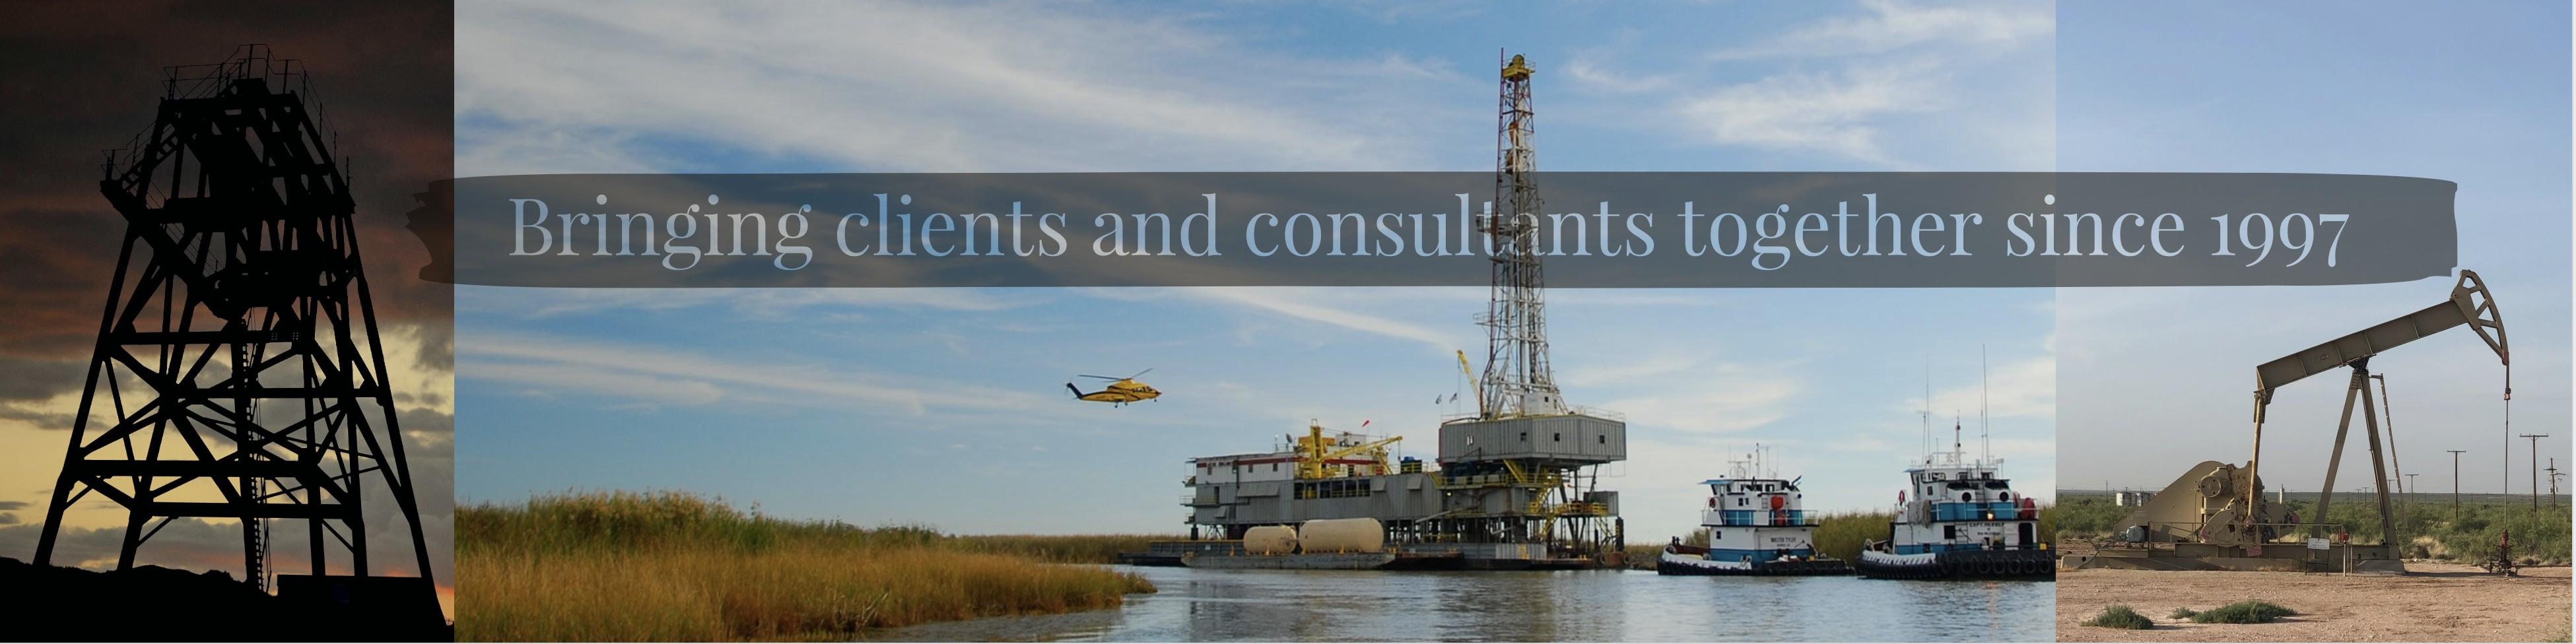 Crescent Drilling Foreman, Inc  | LinkedIn